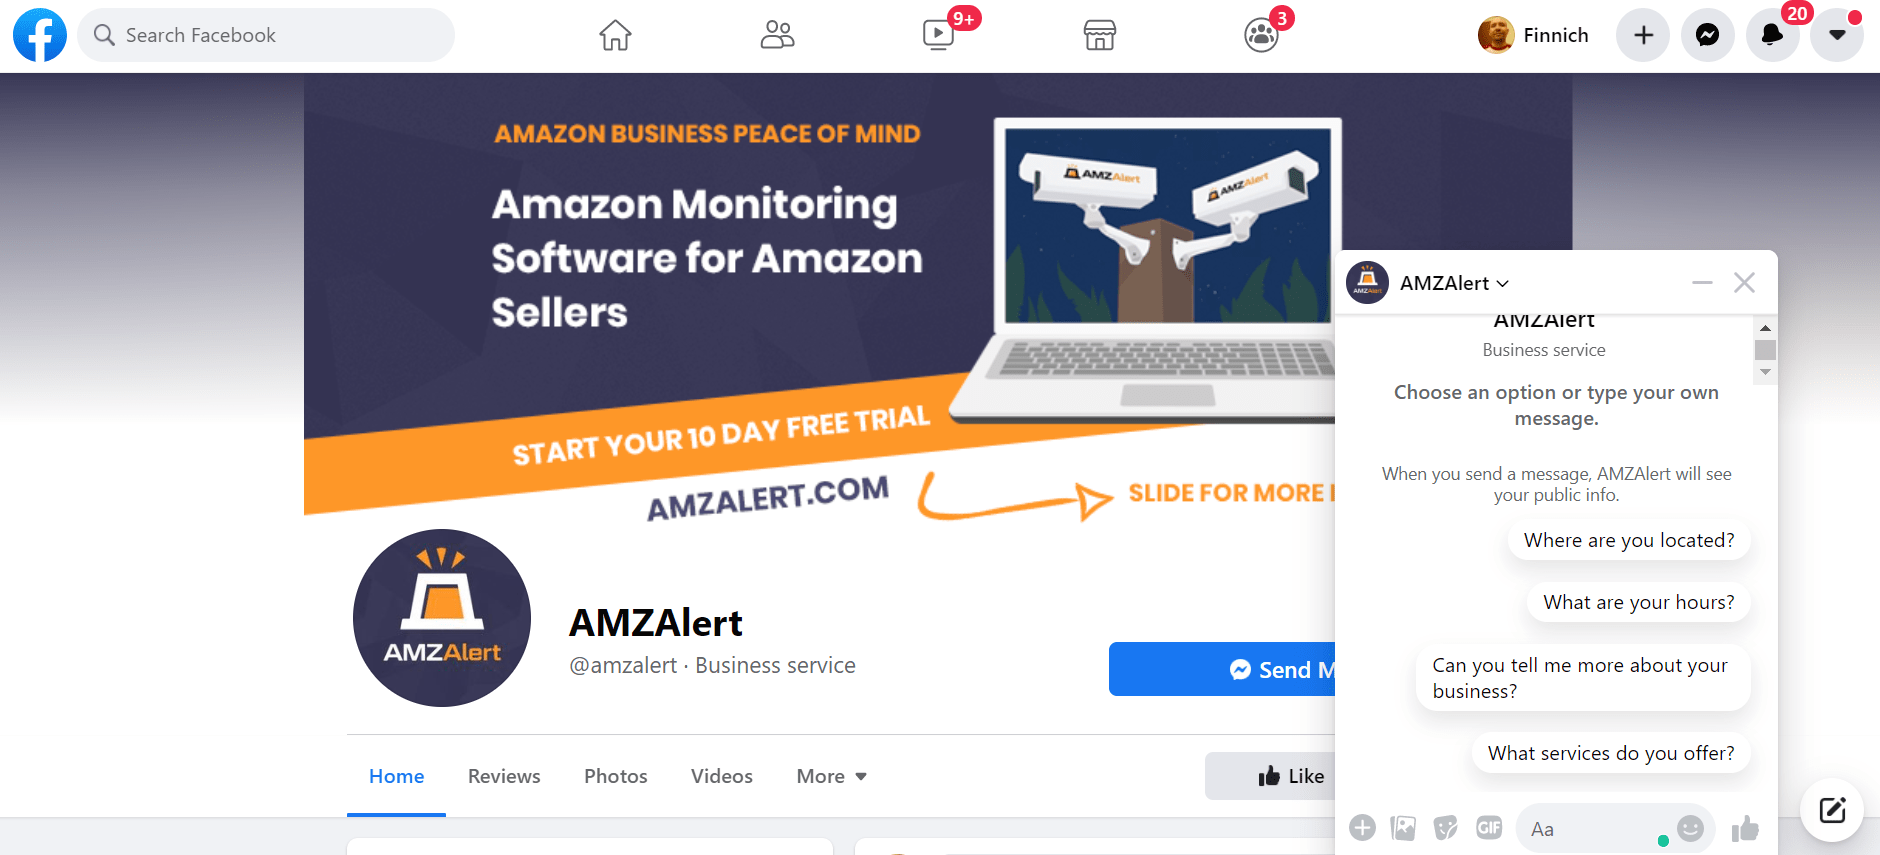 amz alert facebook